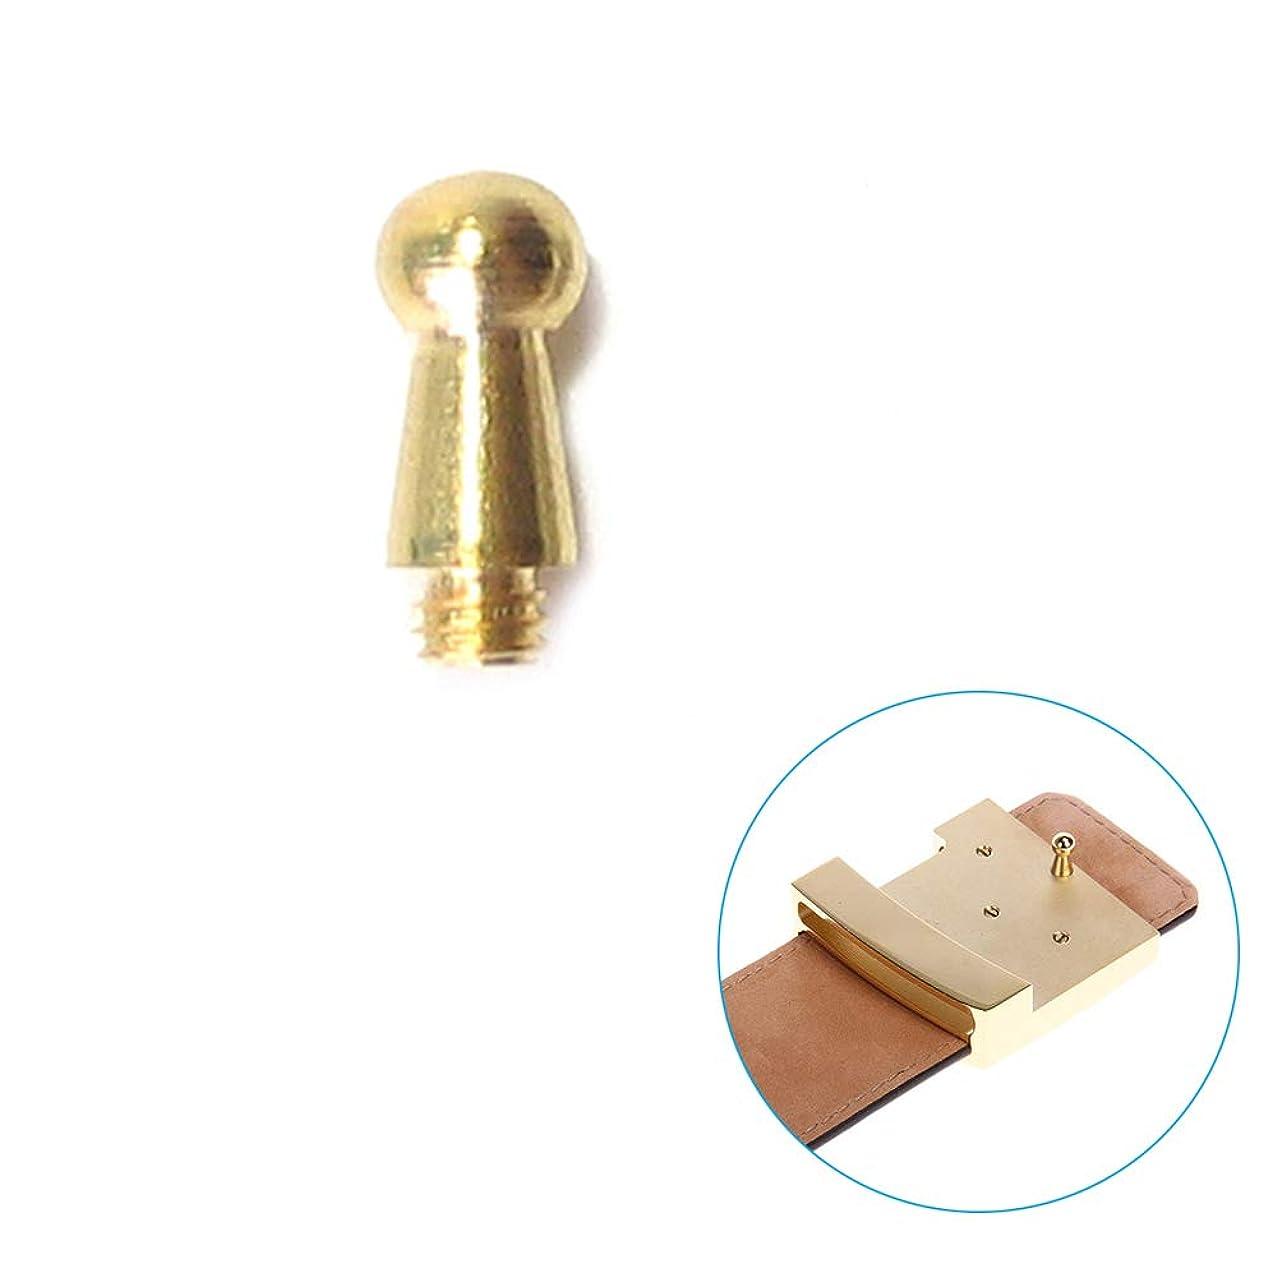 DIY Belt Buckle Screws Hook Replacement for Repair Belts Accessories (3MM, Gold)